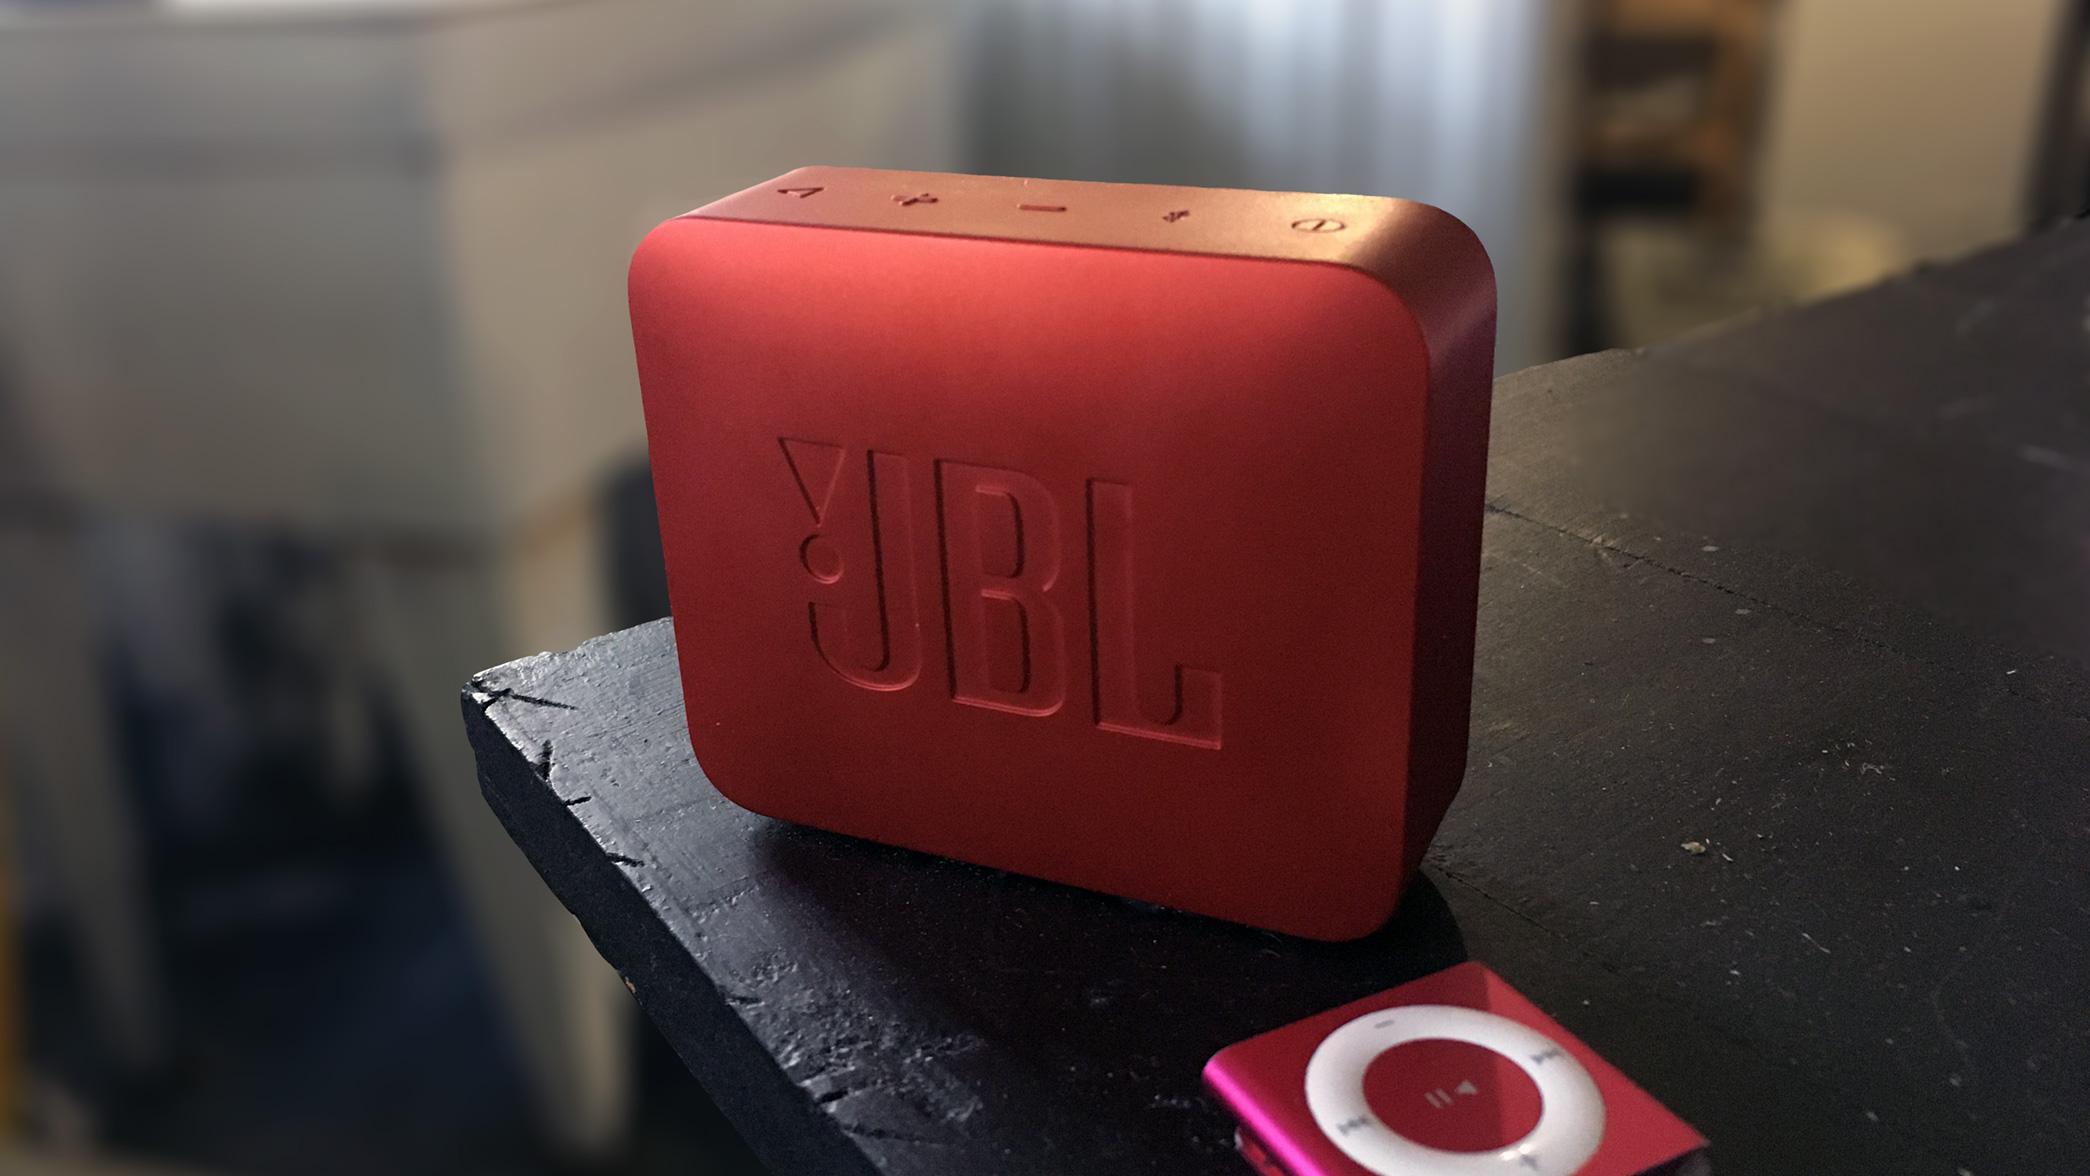 Jbl S Go 2 Pocket Bluetooth Speaker Is The Perfect Last Minute Stocking Stuffer Boing Boing